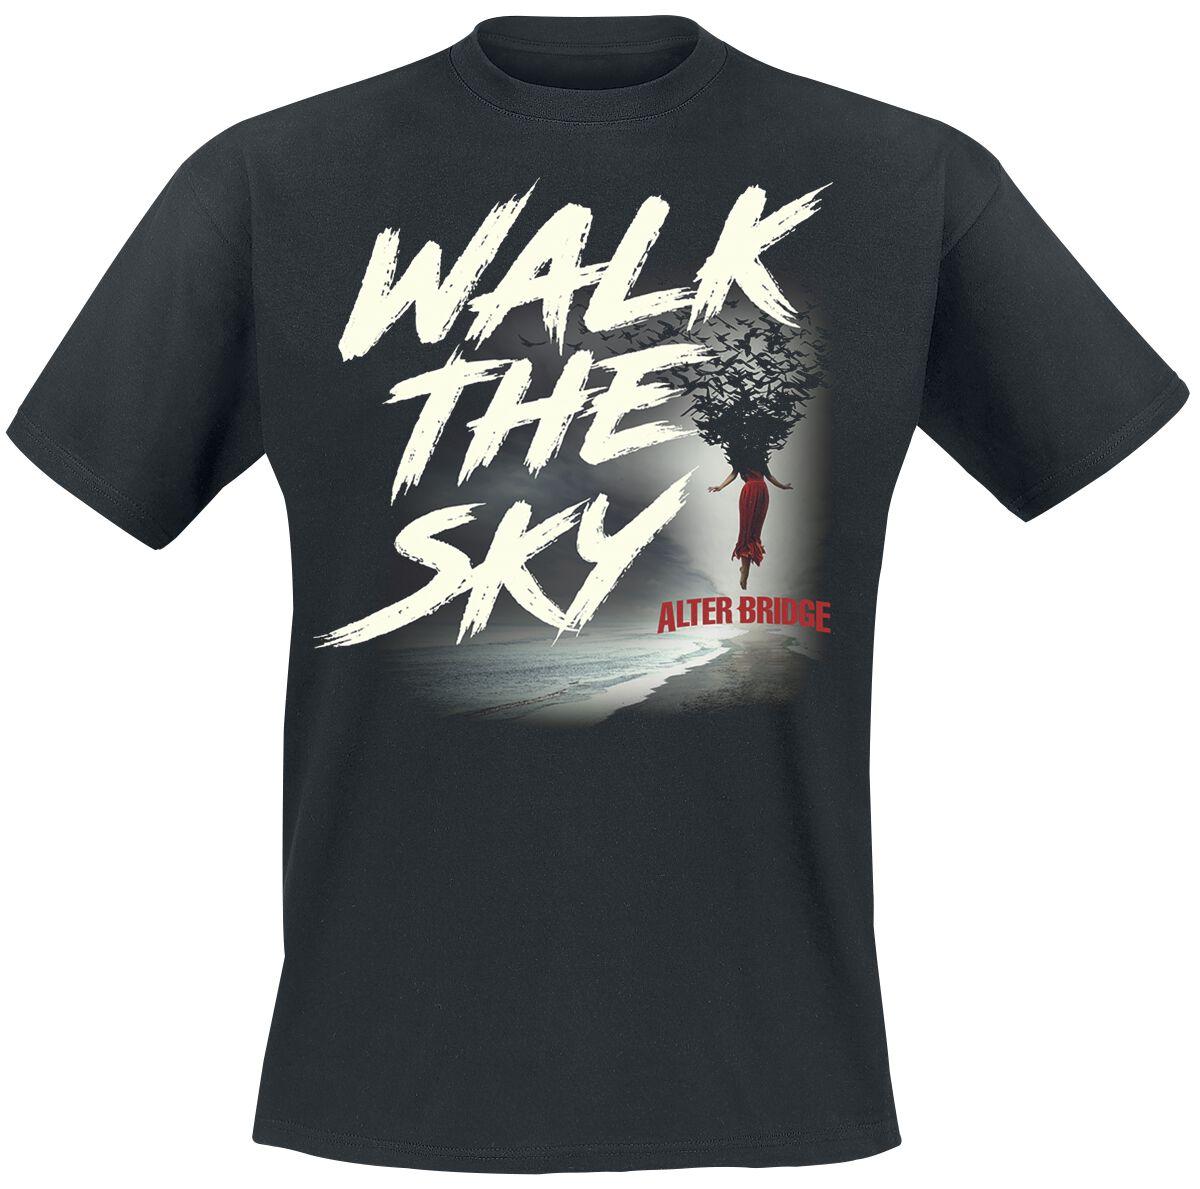 Image of Alter Bridge Walk the sky T-Shirt schwarz